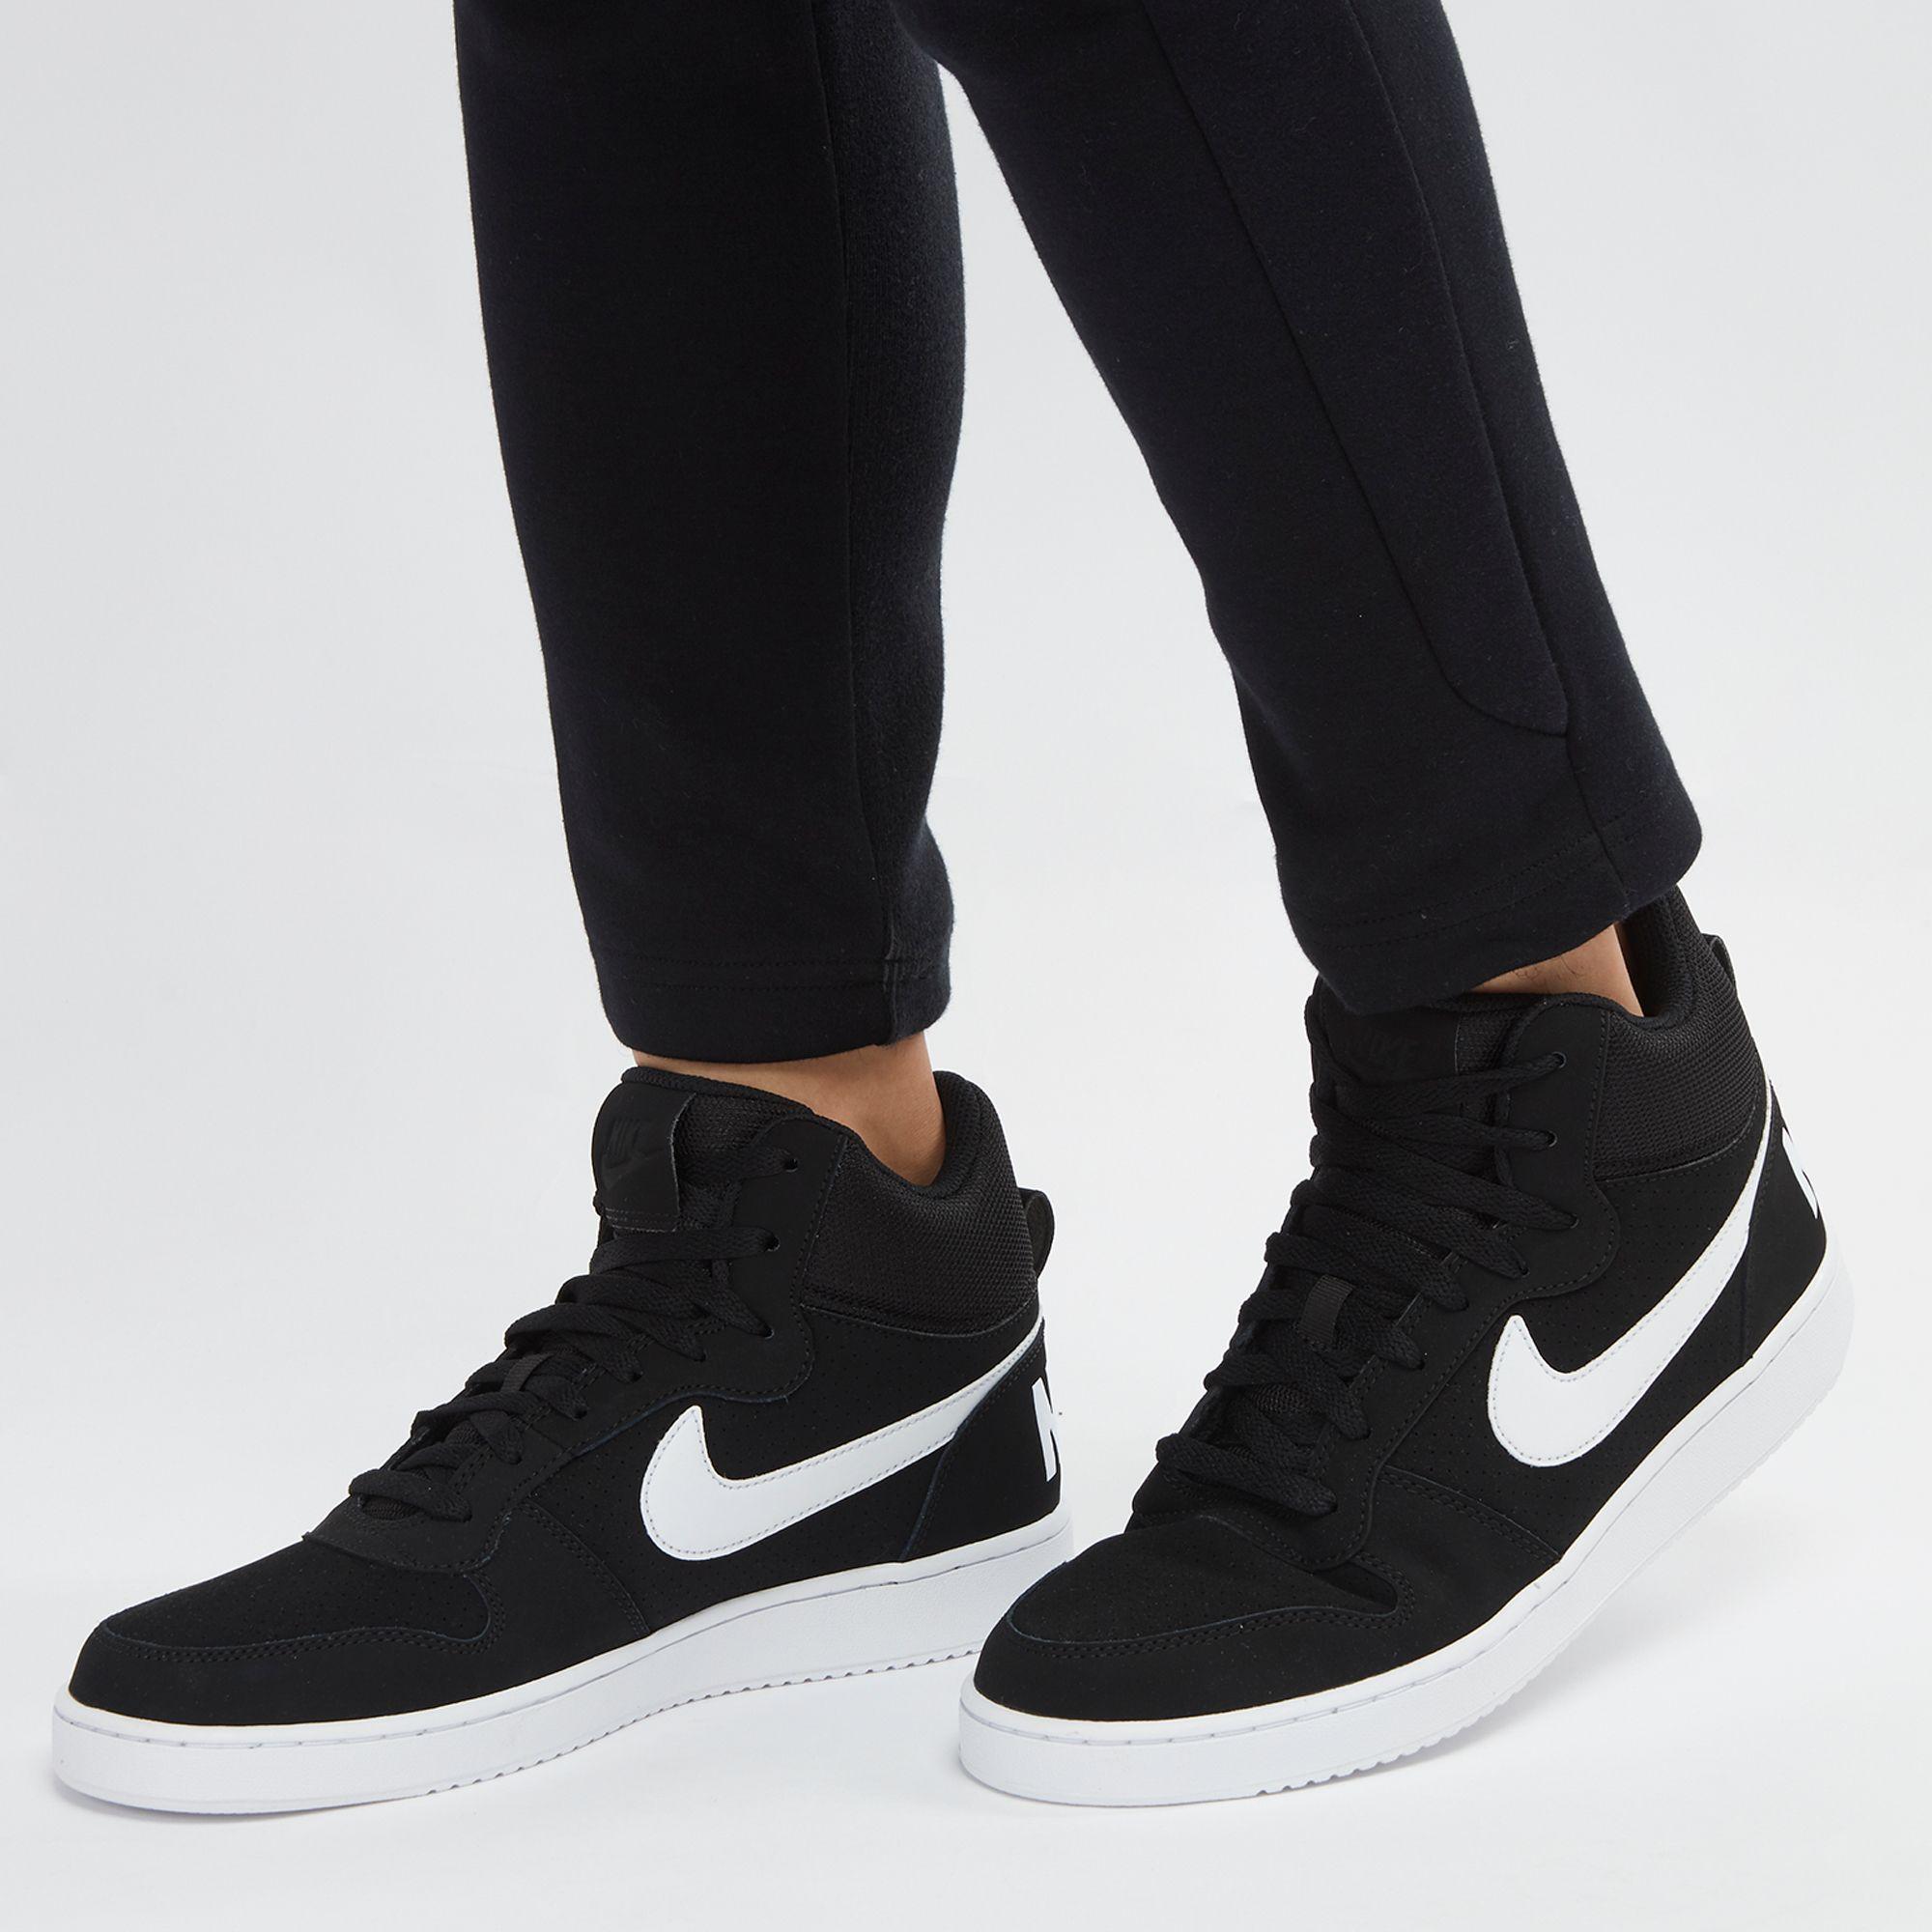 NIKE Nike men sneakers COURT BOROUGH MID SL coat Barlow mid SL 844,885 111 white white white white